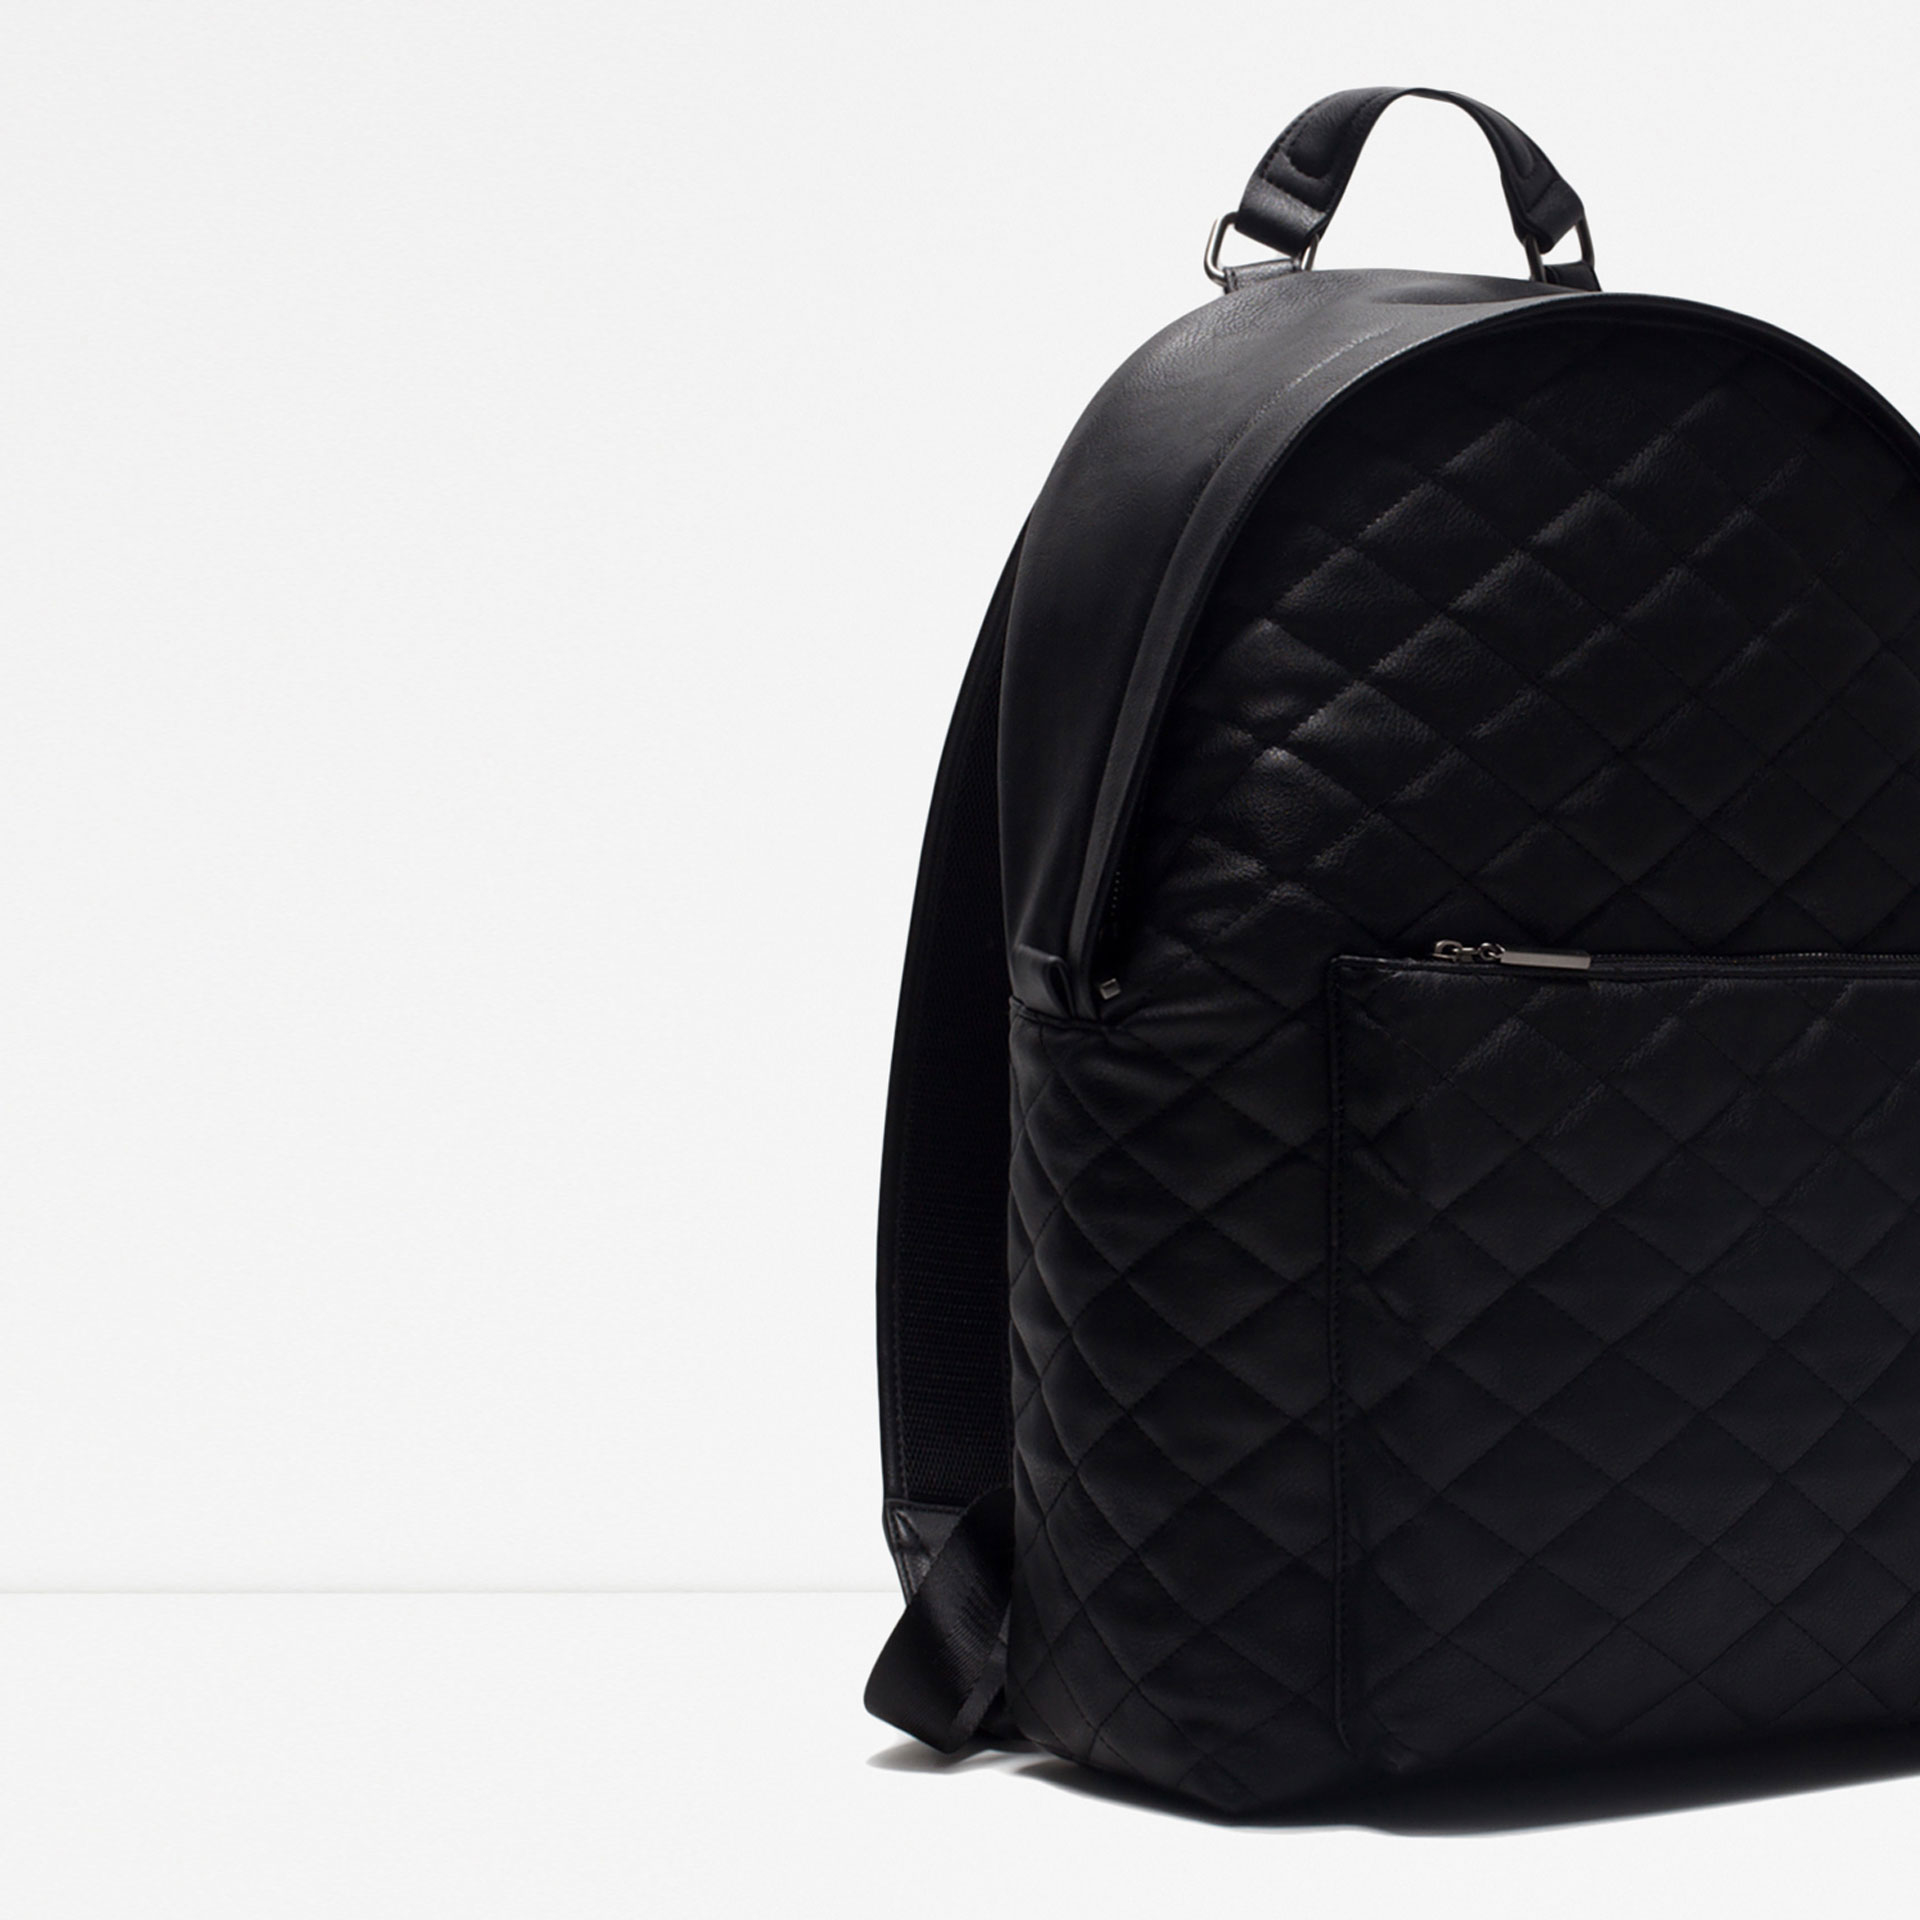 Mens Quilted Backpack | Cg Backpacks : quilted rucksack zara - Adamdwight.com